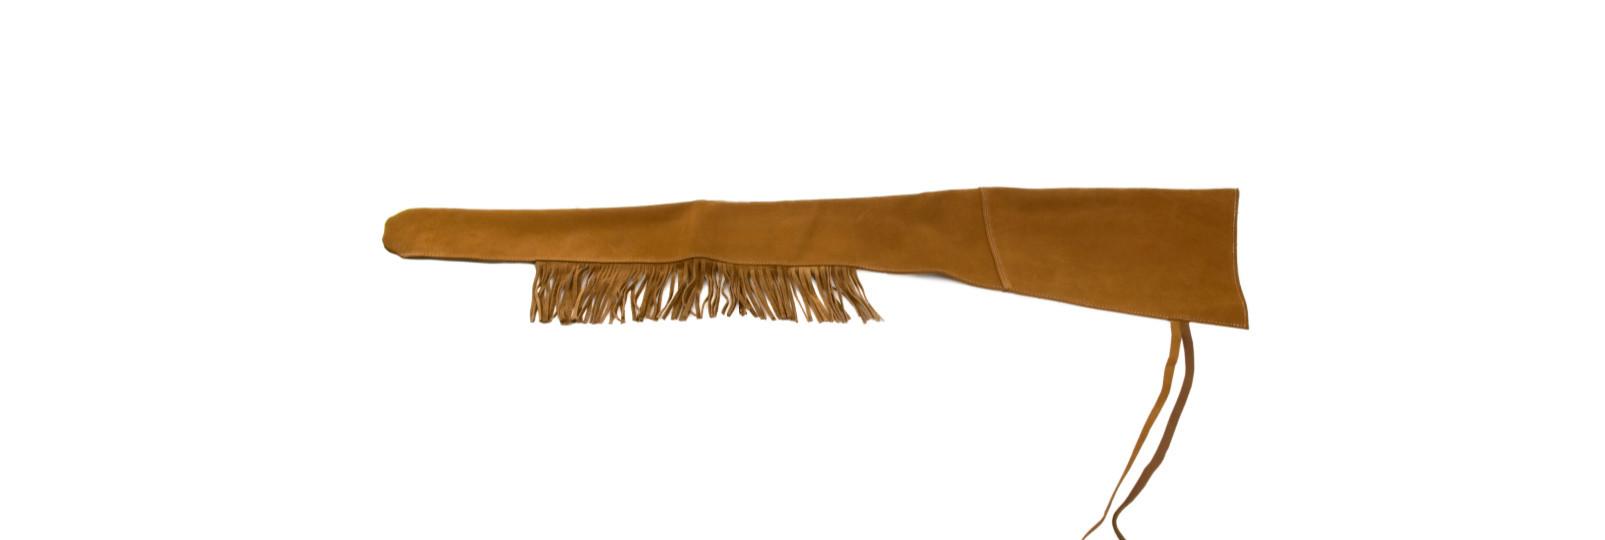 Long leather gun sleeve